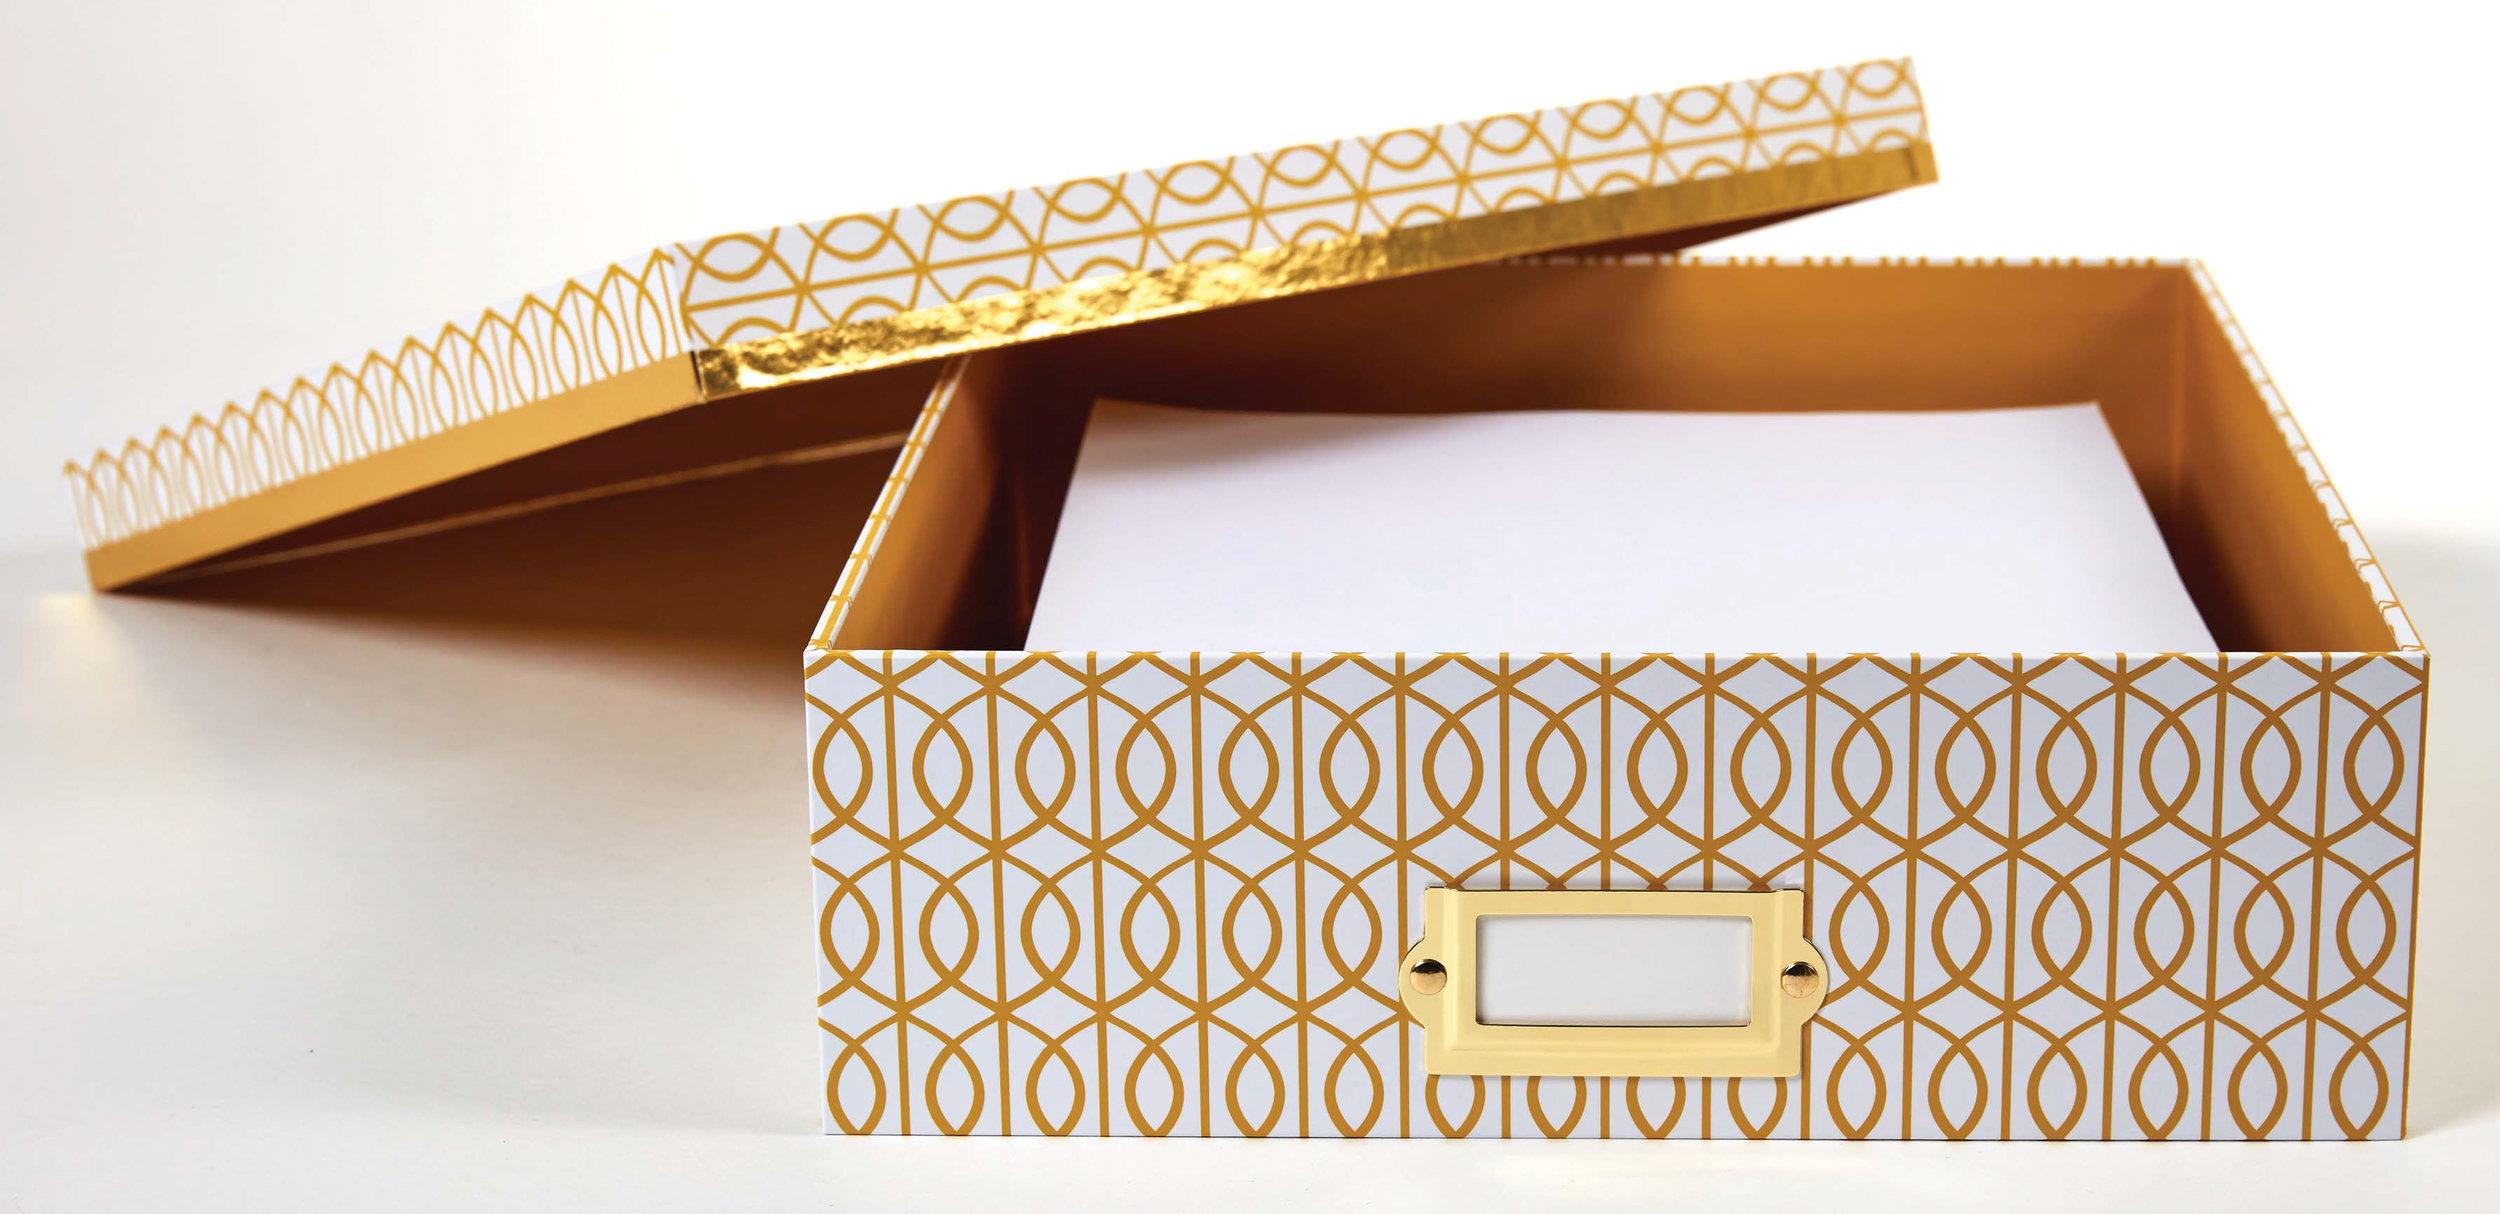 DS desktop storage box yellow gate pattern paper open.jpg